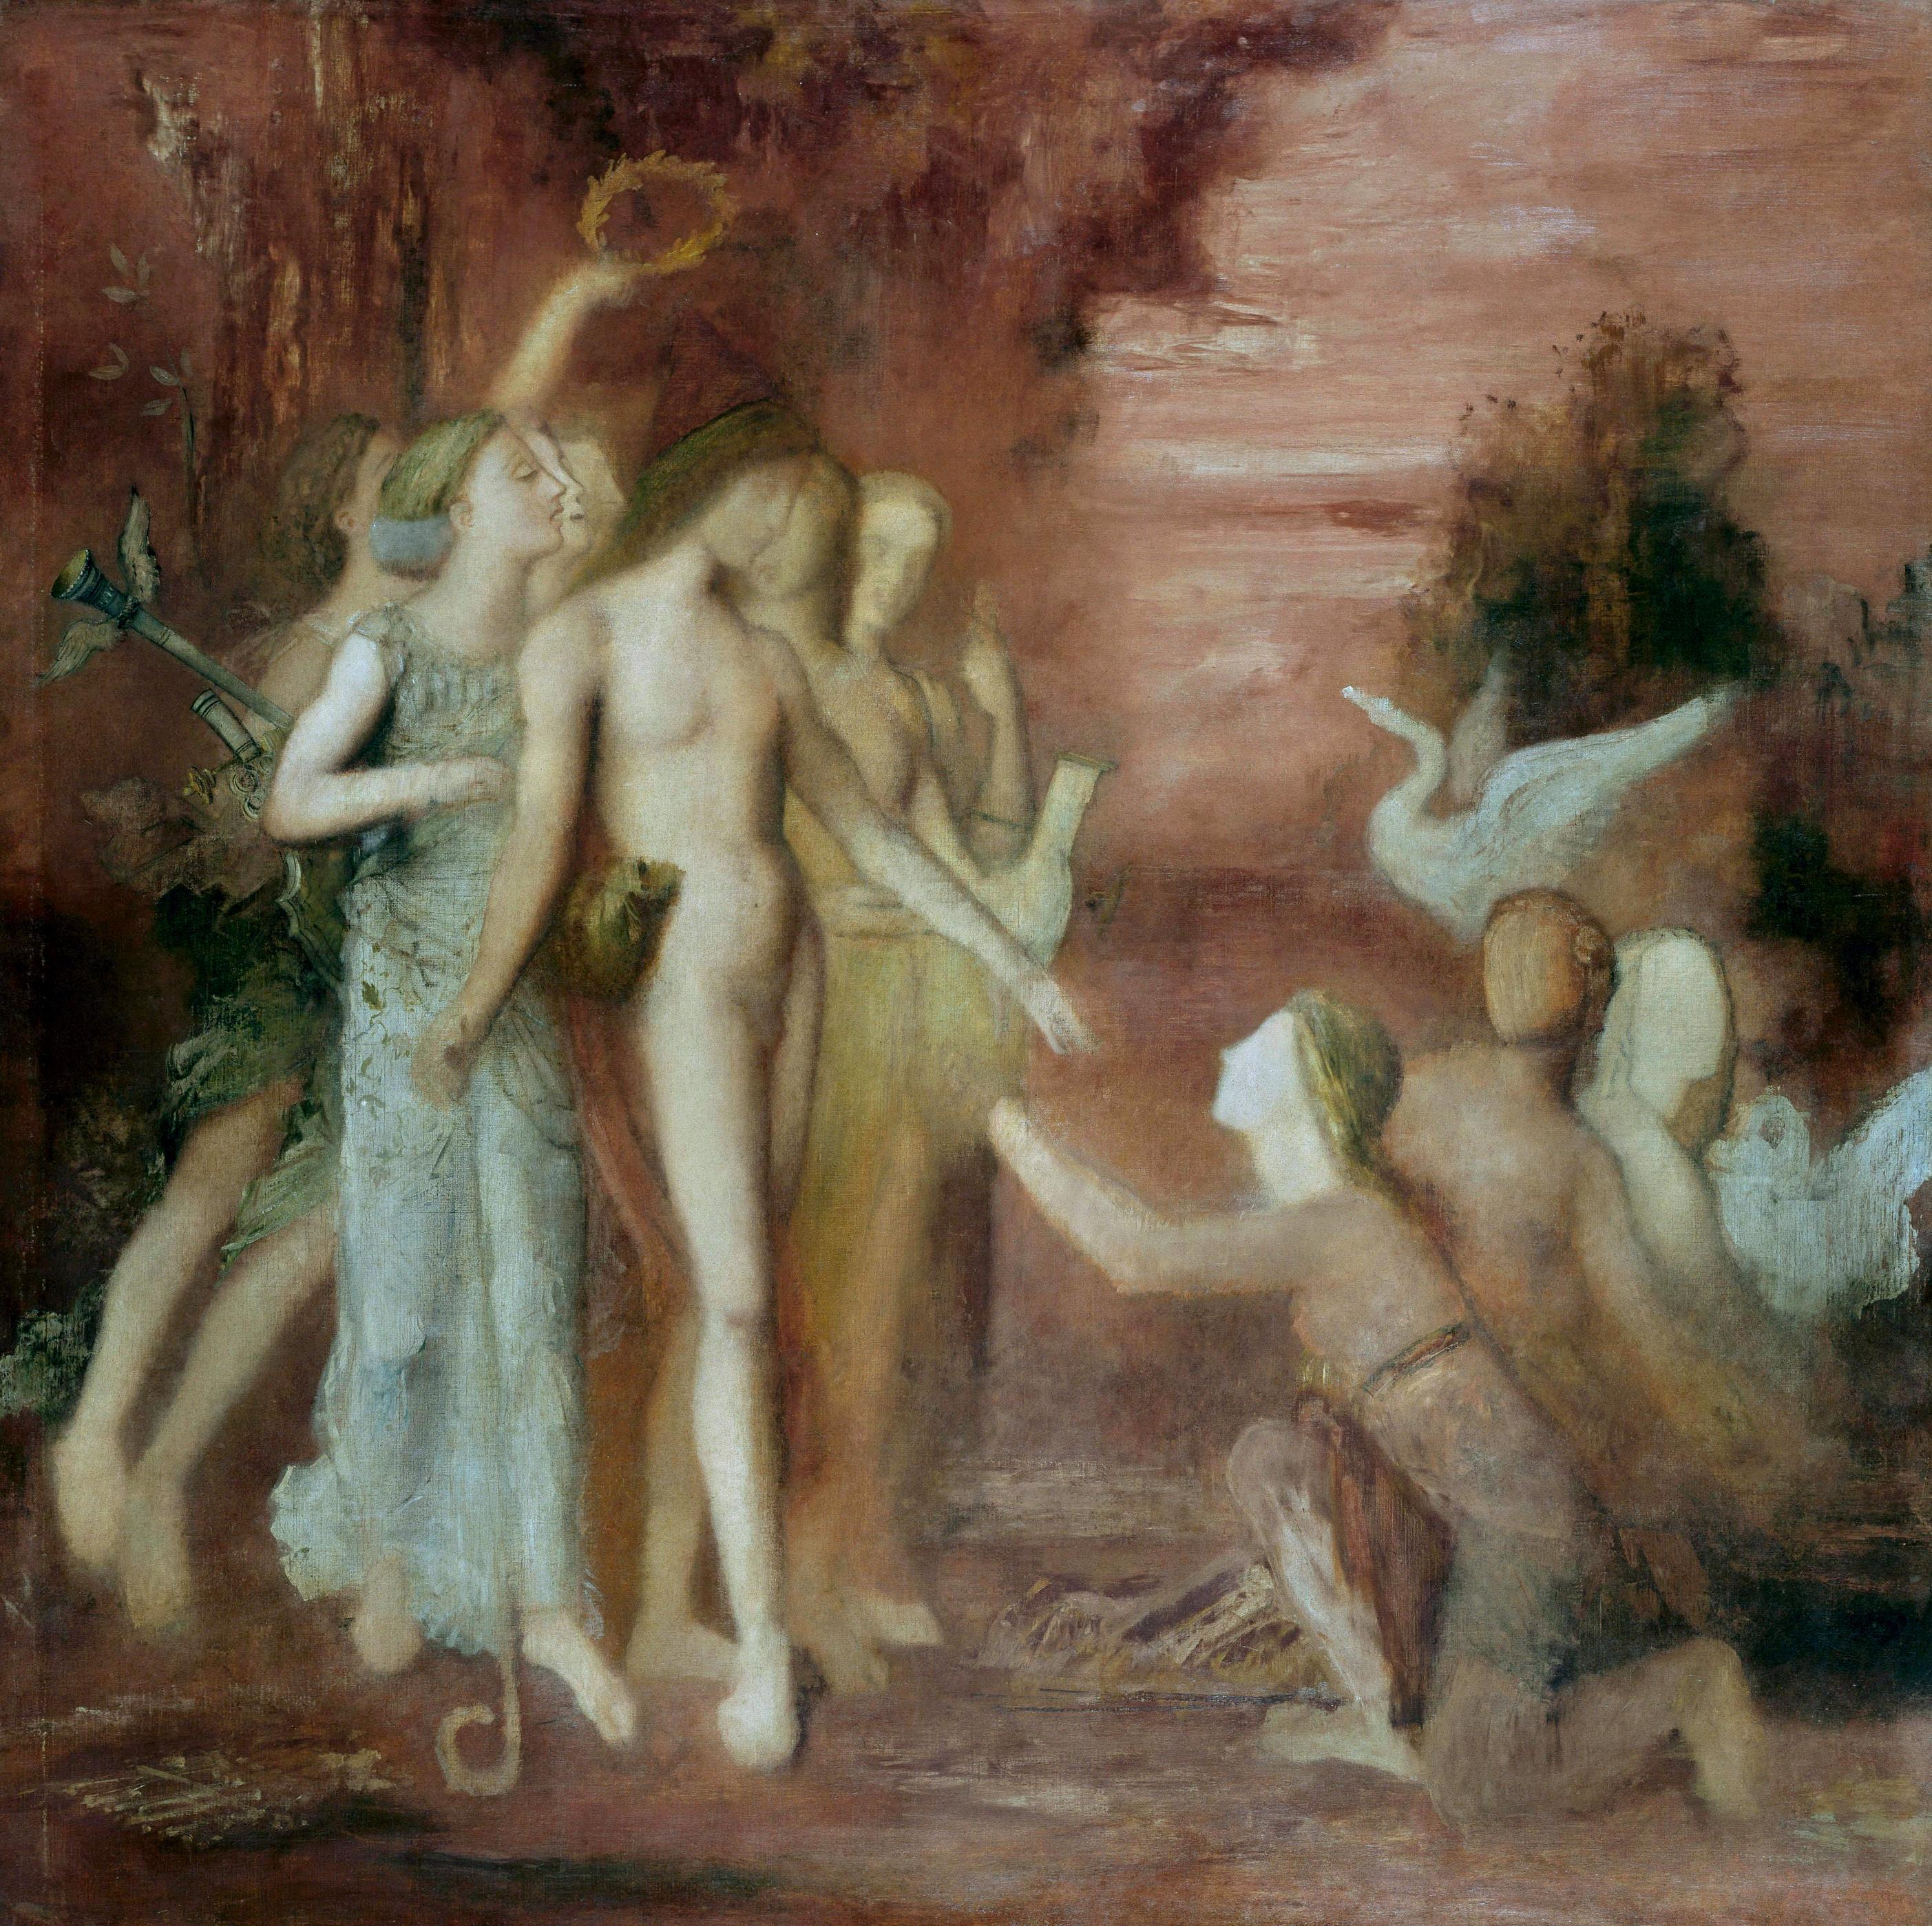 Гесиод и музы (133 х 133 см) (Париж, музей Гюстава Моро)